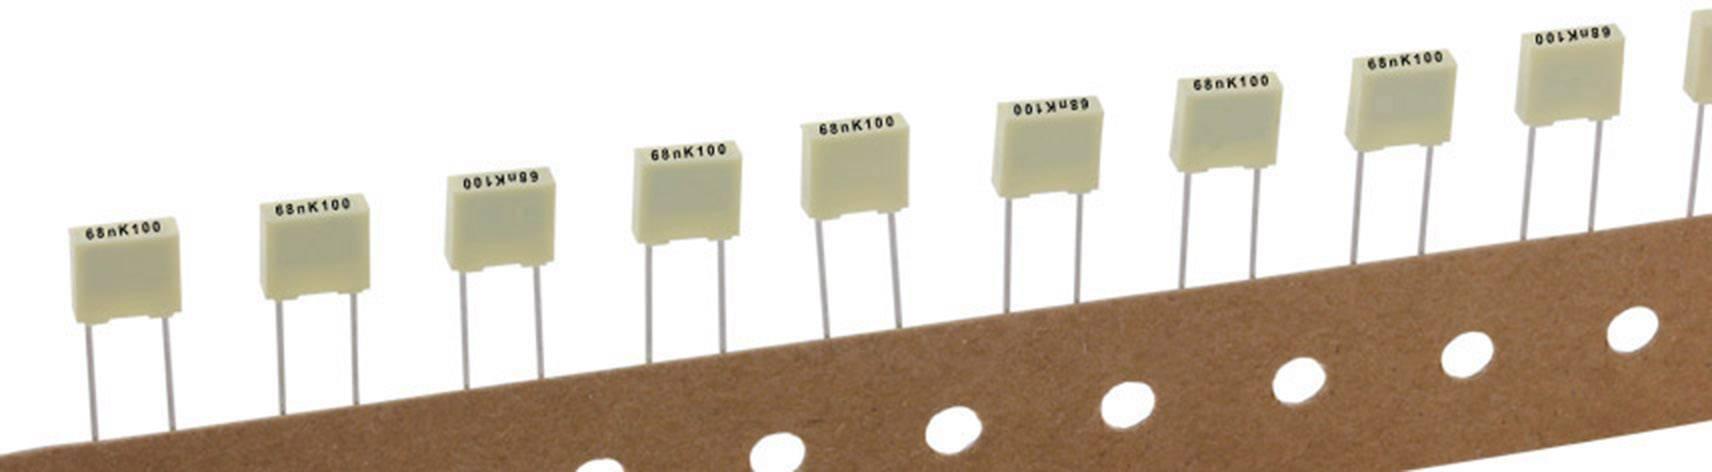 Polyesterový kondenzátor Kemet R82EC1100DQ50K+ radiální, 1 nF, 100 V,10 %, 5 mm, (d x š x v) 7.2 x 2.5 mm x 6.5 mm, 1 ks